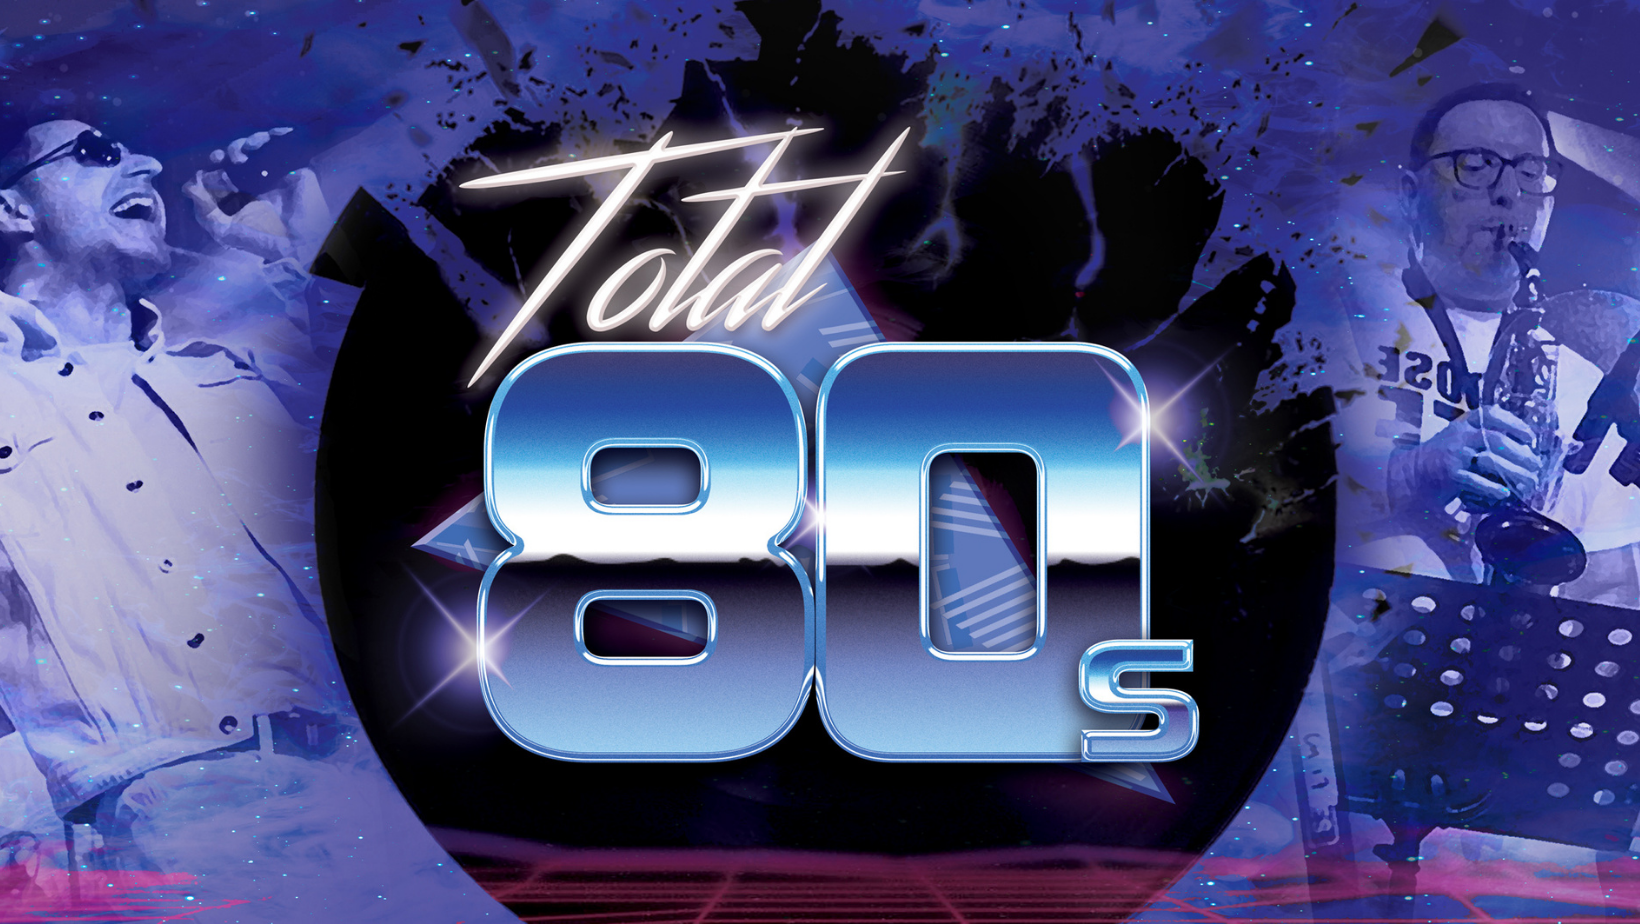 Total 80s logo